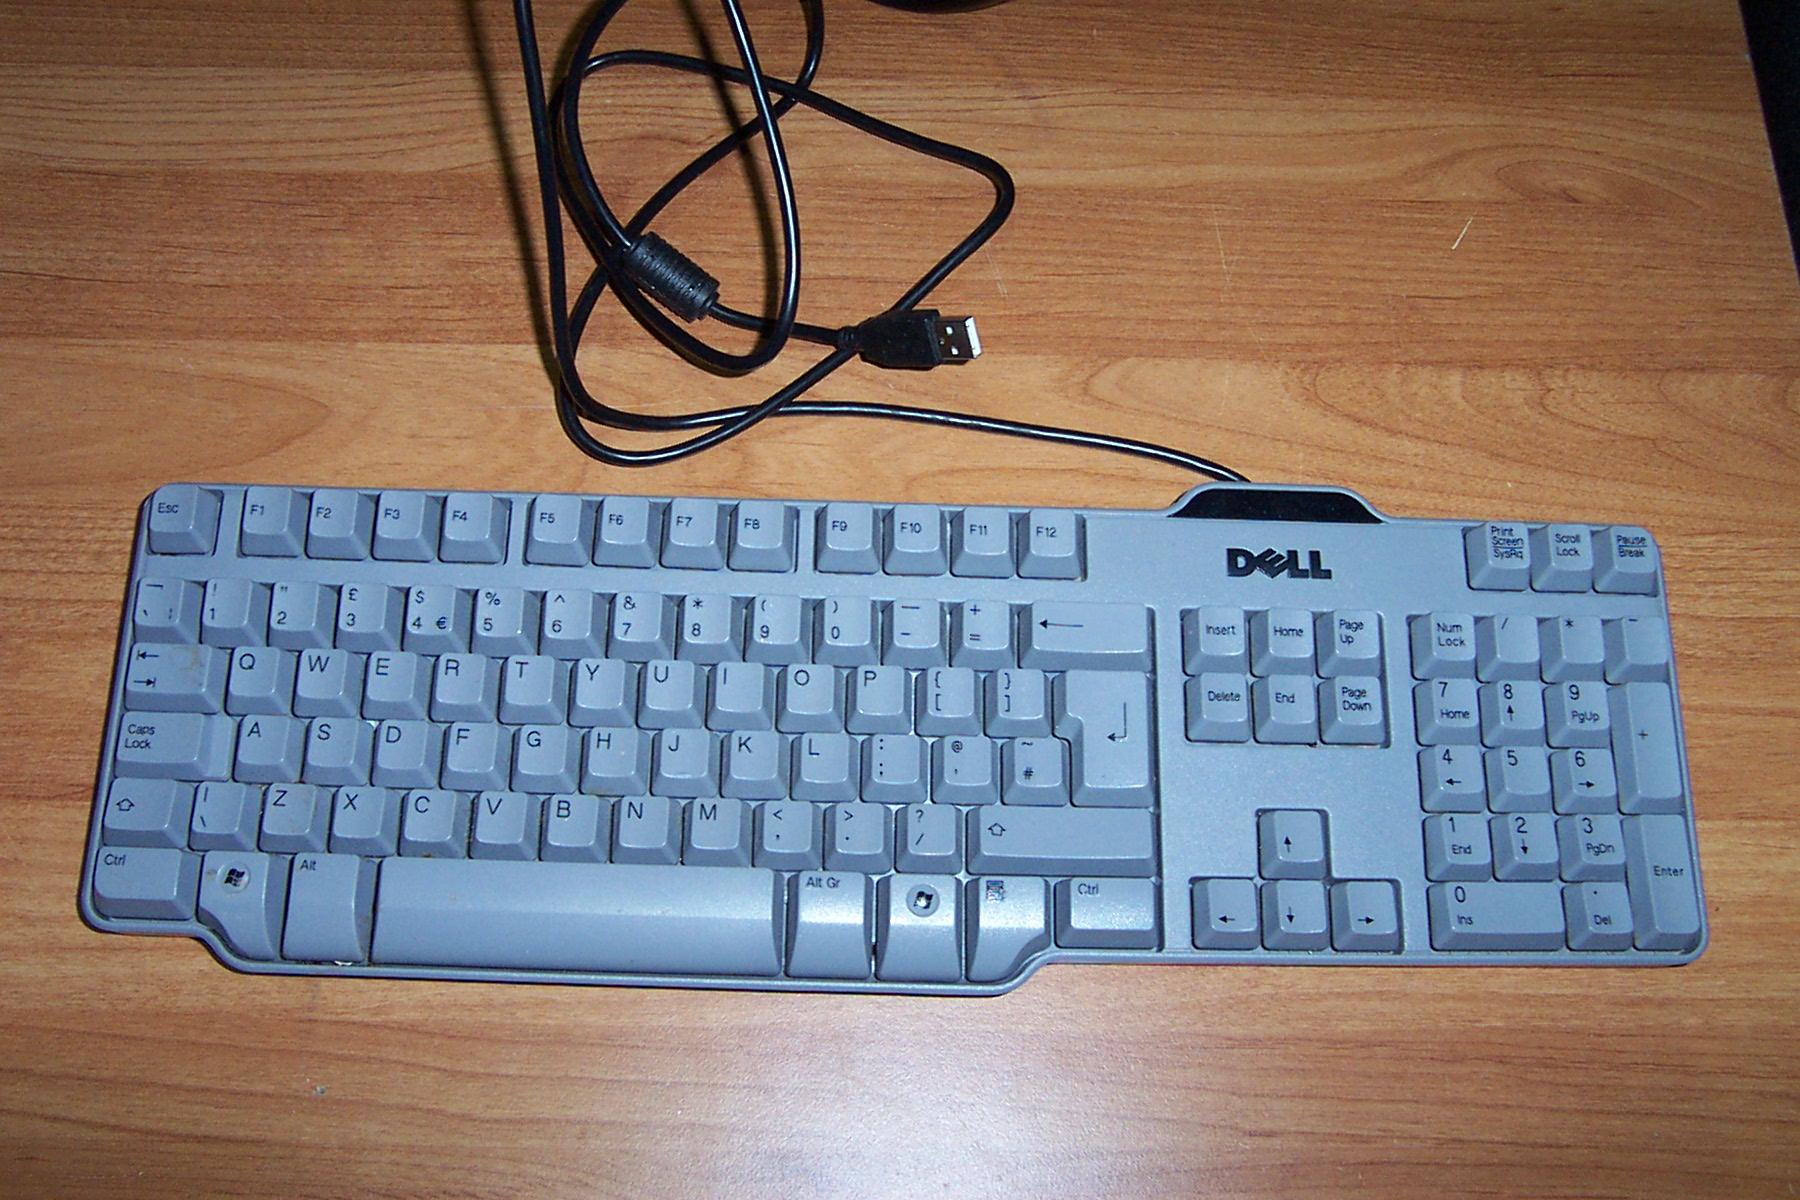 usb keyboard diagram ez go golf cart wiring gas dell hk216 uk layout keyboards blackmore it